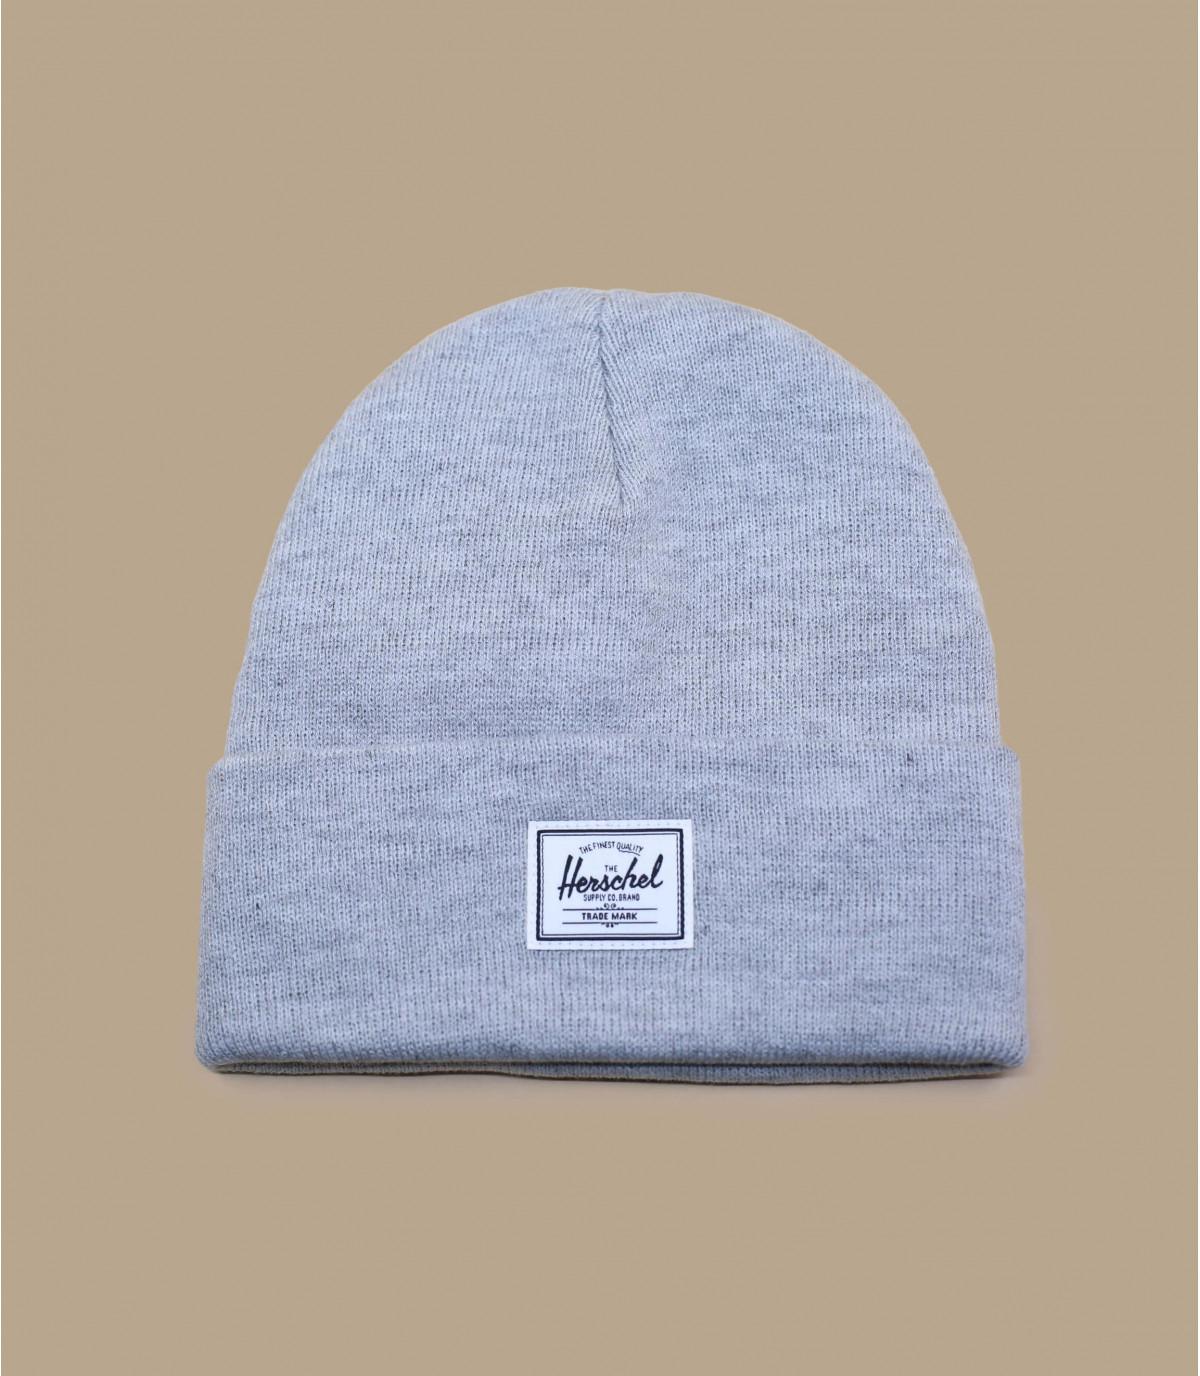 bonnet Herschel gris chiné